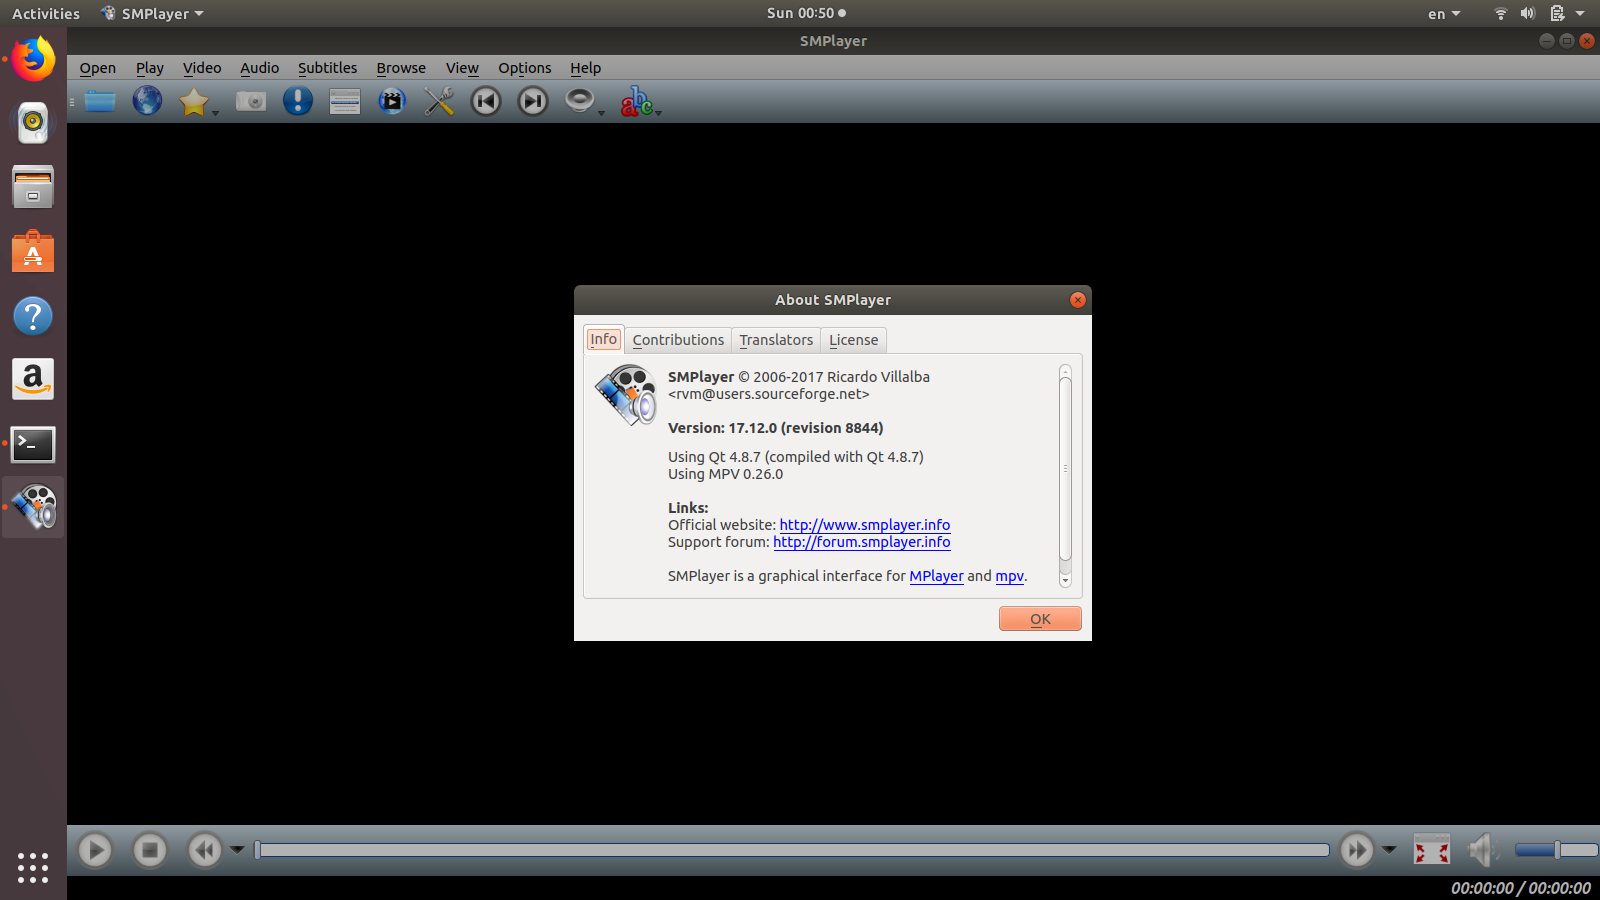 How to install program on Ubuntu: December 2017